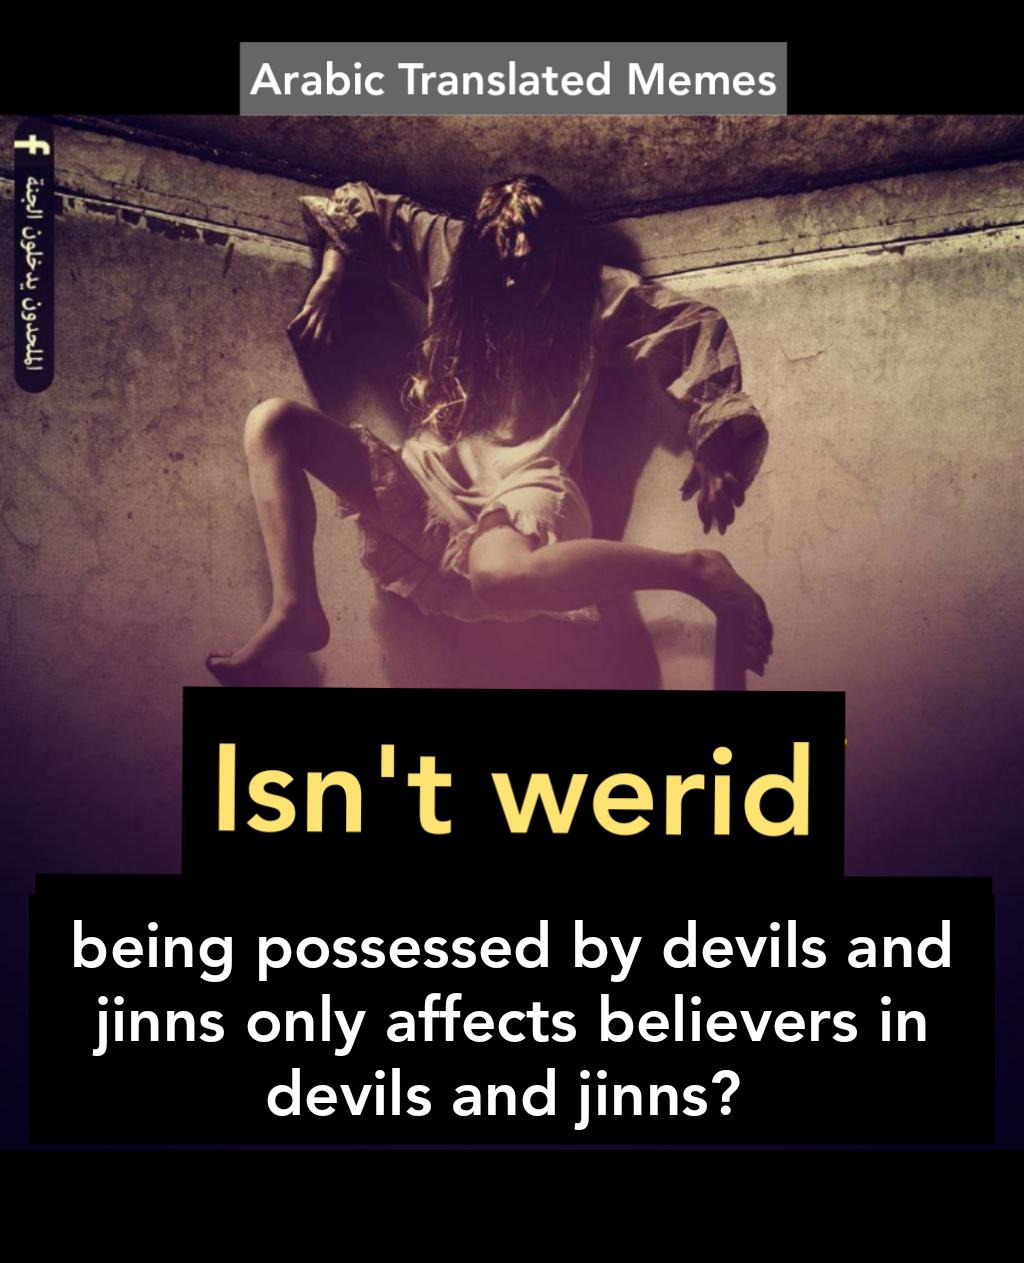 jin jinns possessed devils devil hoax lies